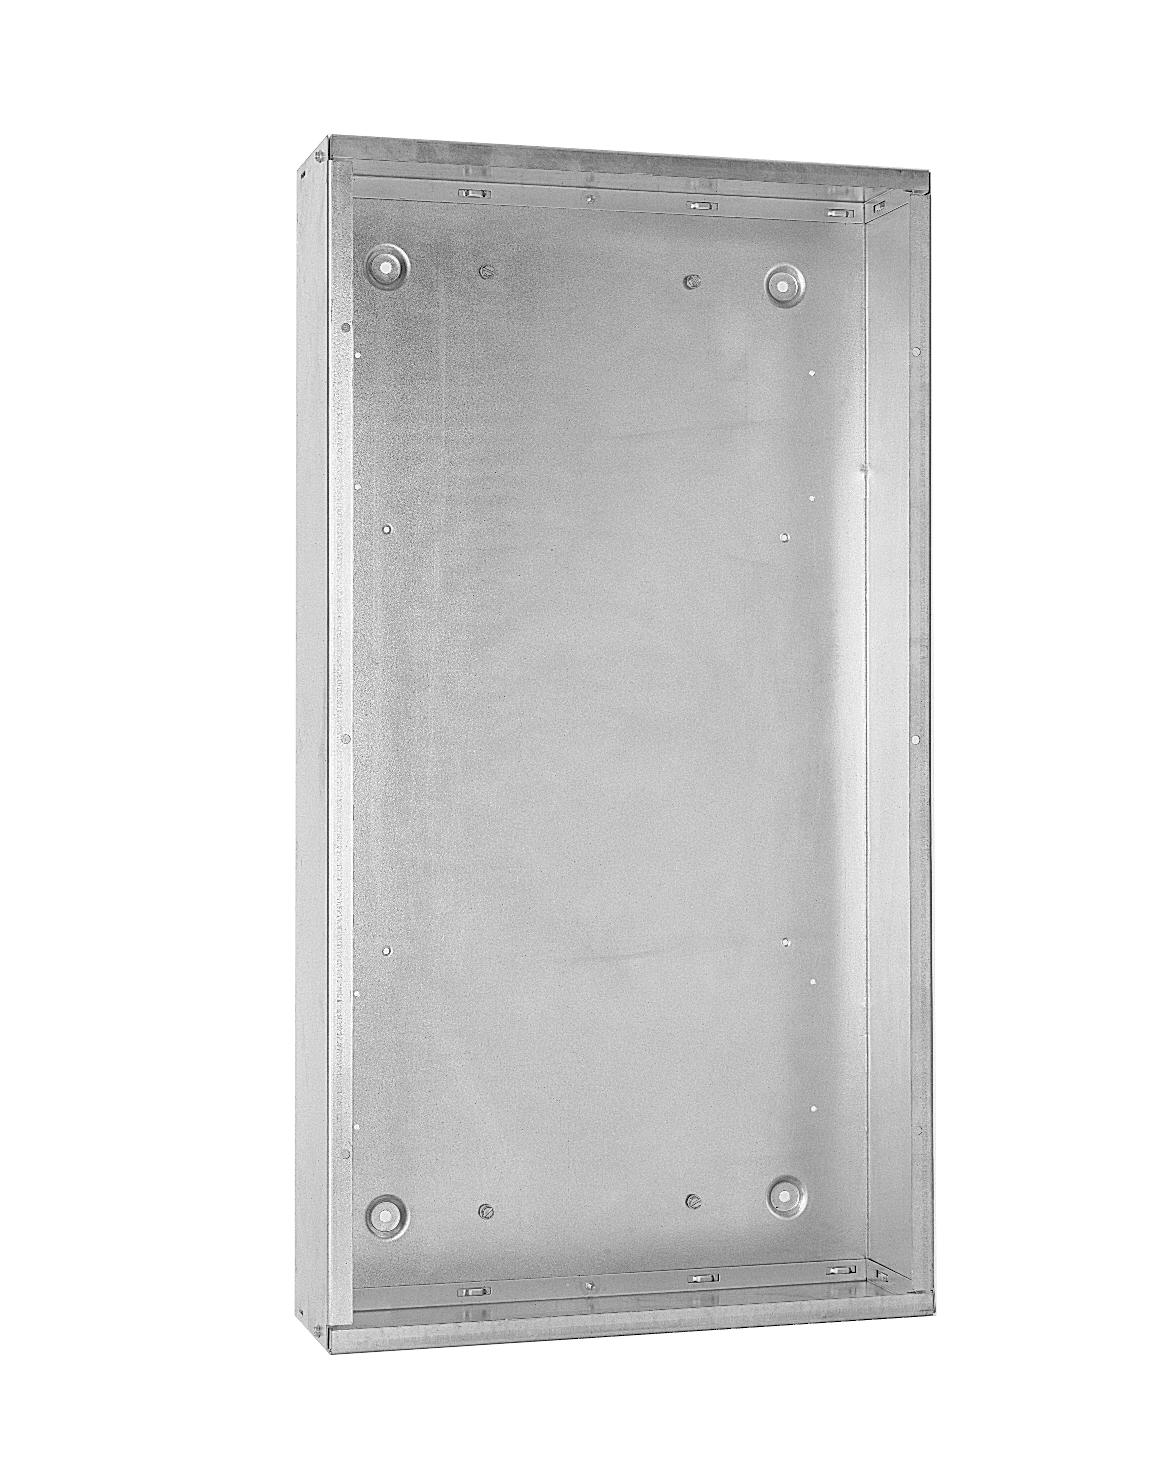 GE,AB31B,General Electric AB31B Panel Board Box, Enclosure: NEMA 1, Size: 31.50 Height X 20.000 Width X 5.81 IN Depth